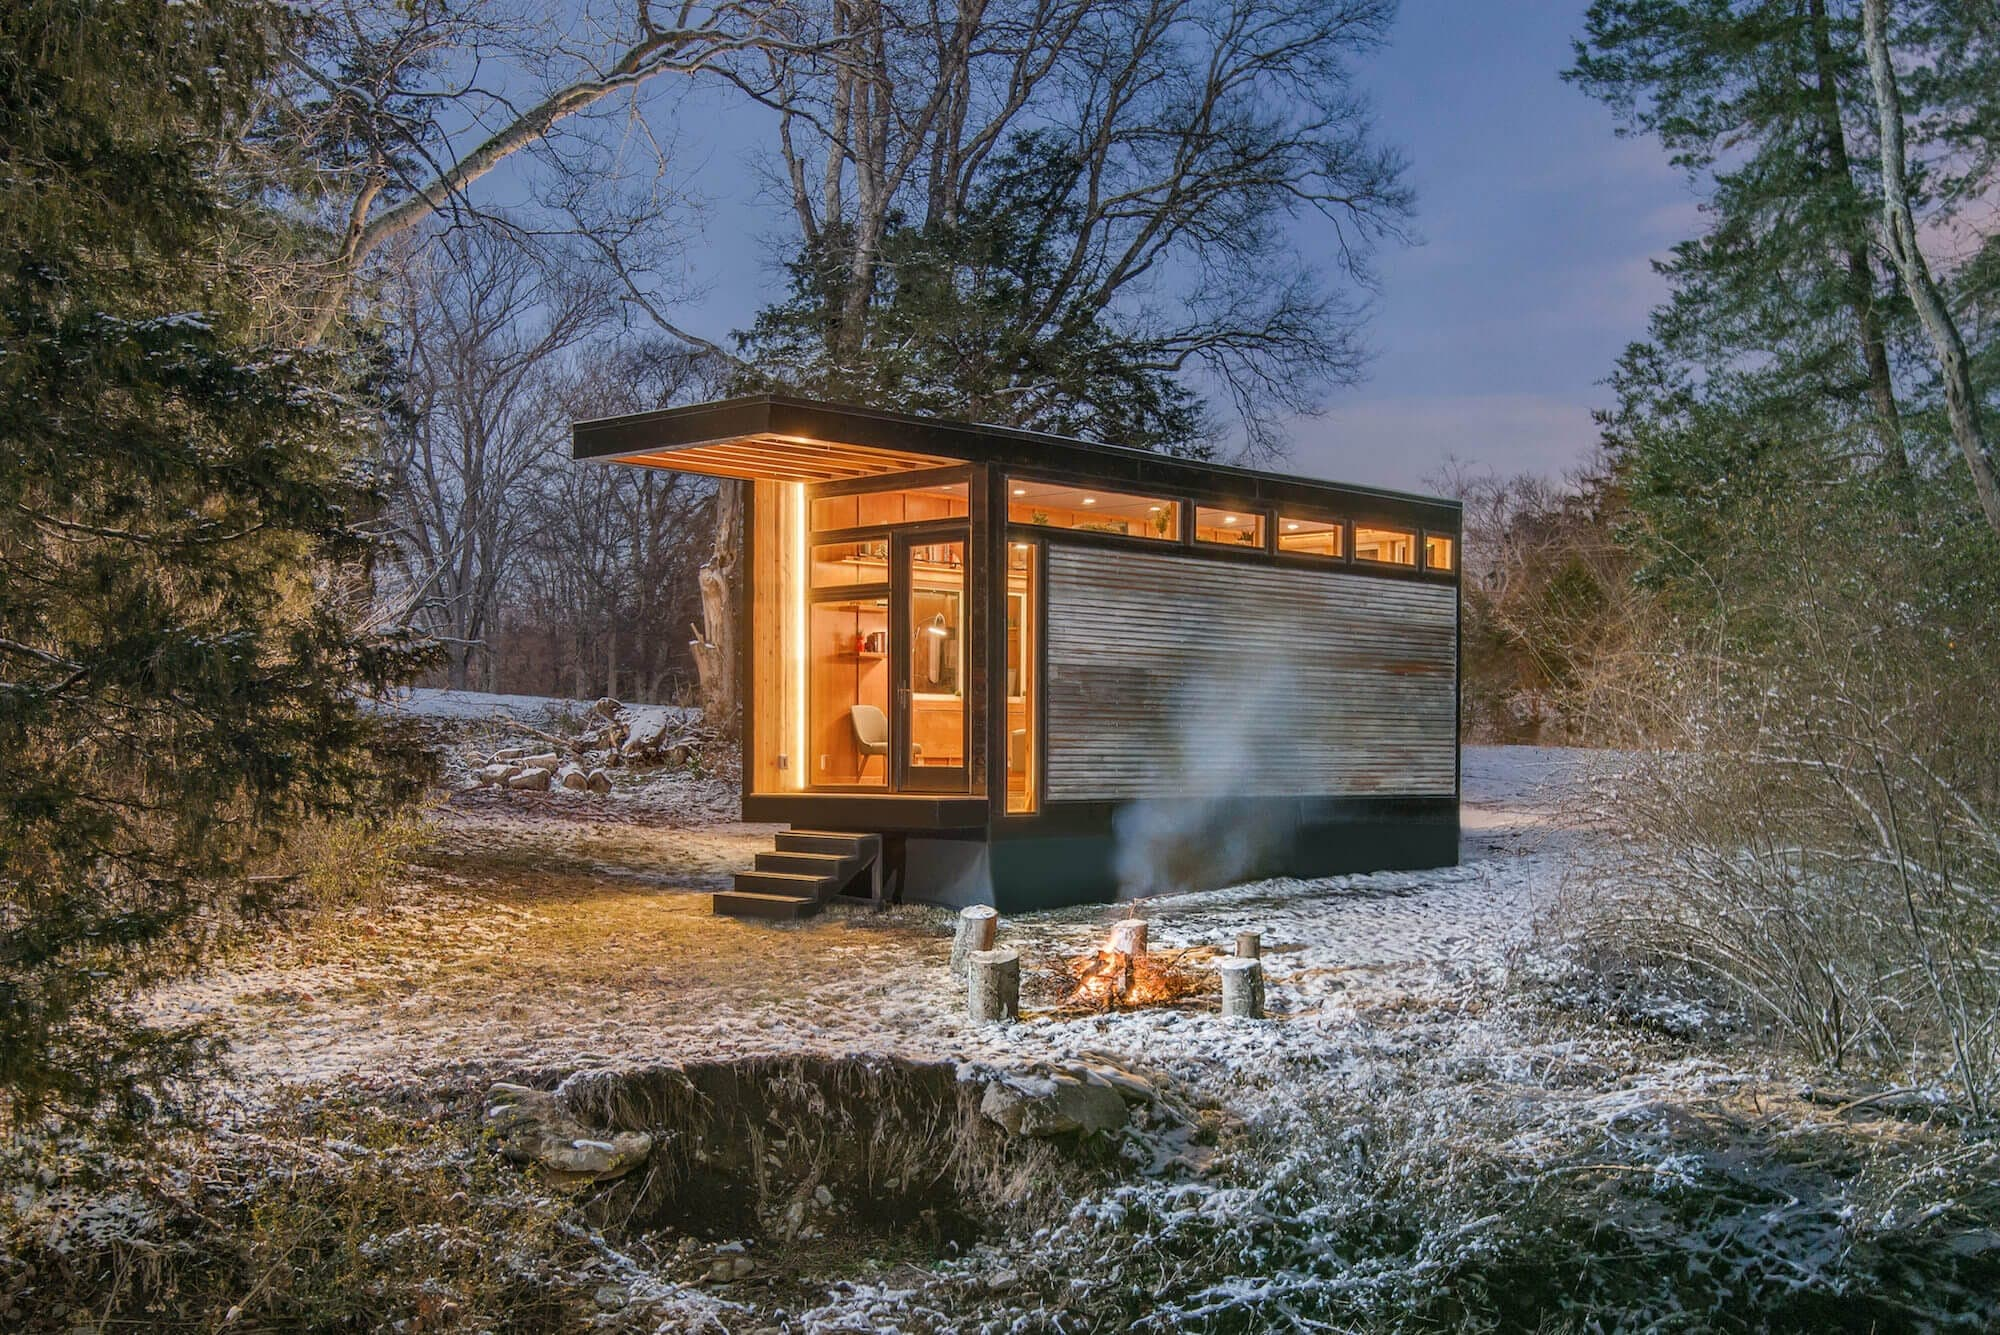 Ein sonderbares Refugium inmitten der Natur: The Cornelia Tiny House 1